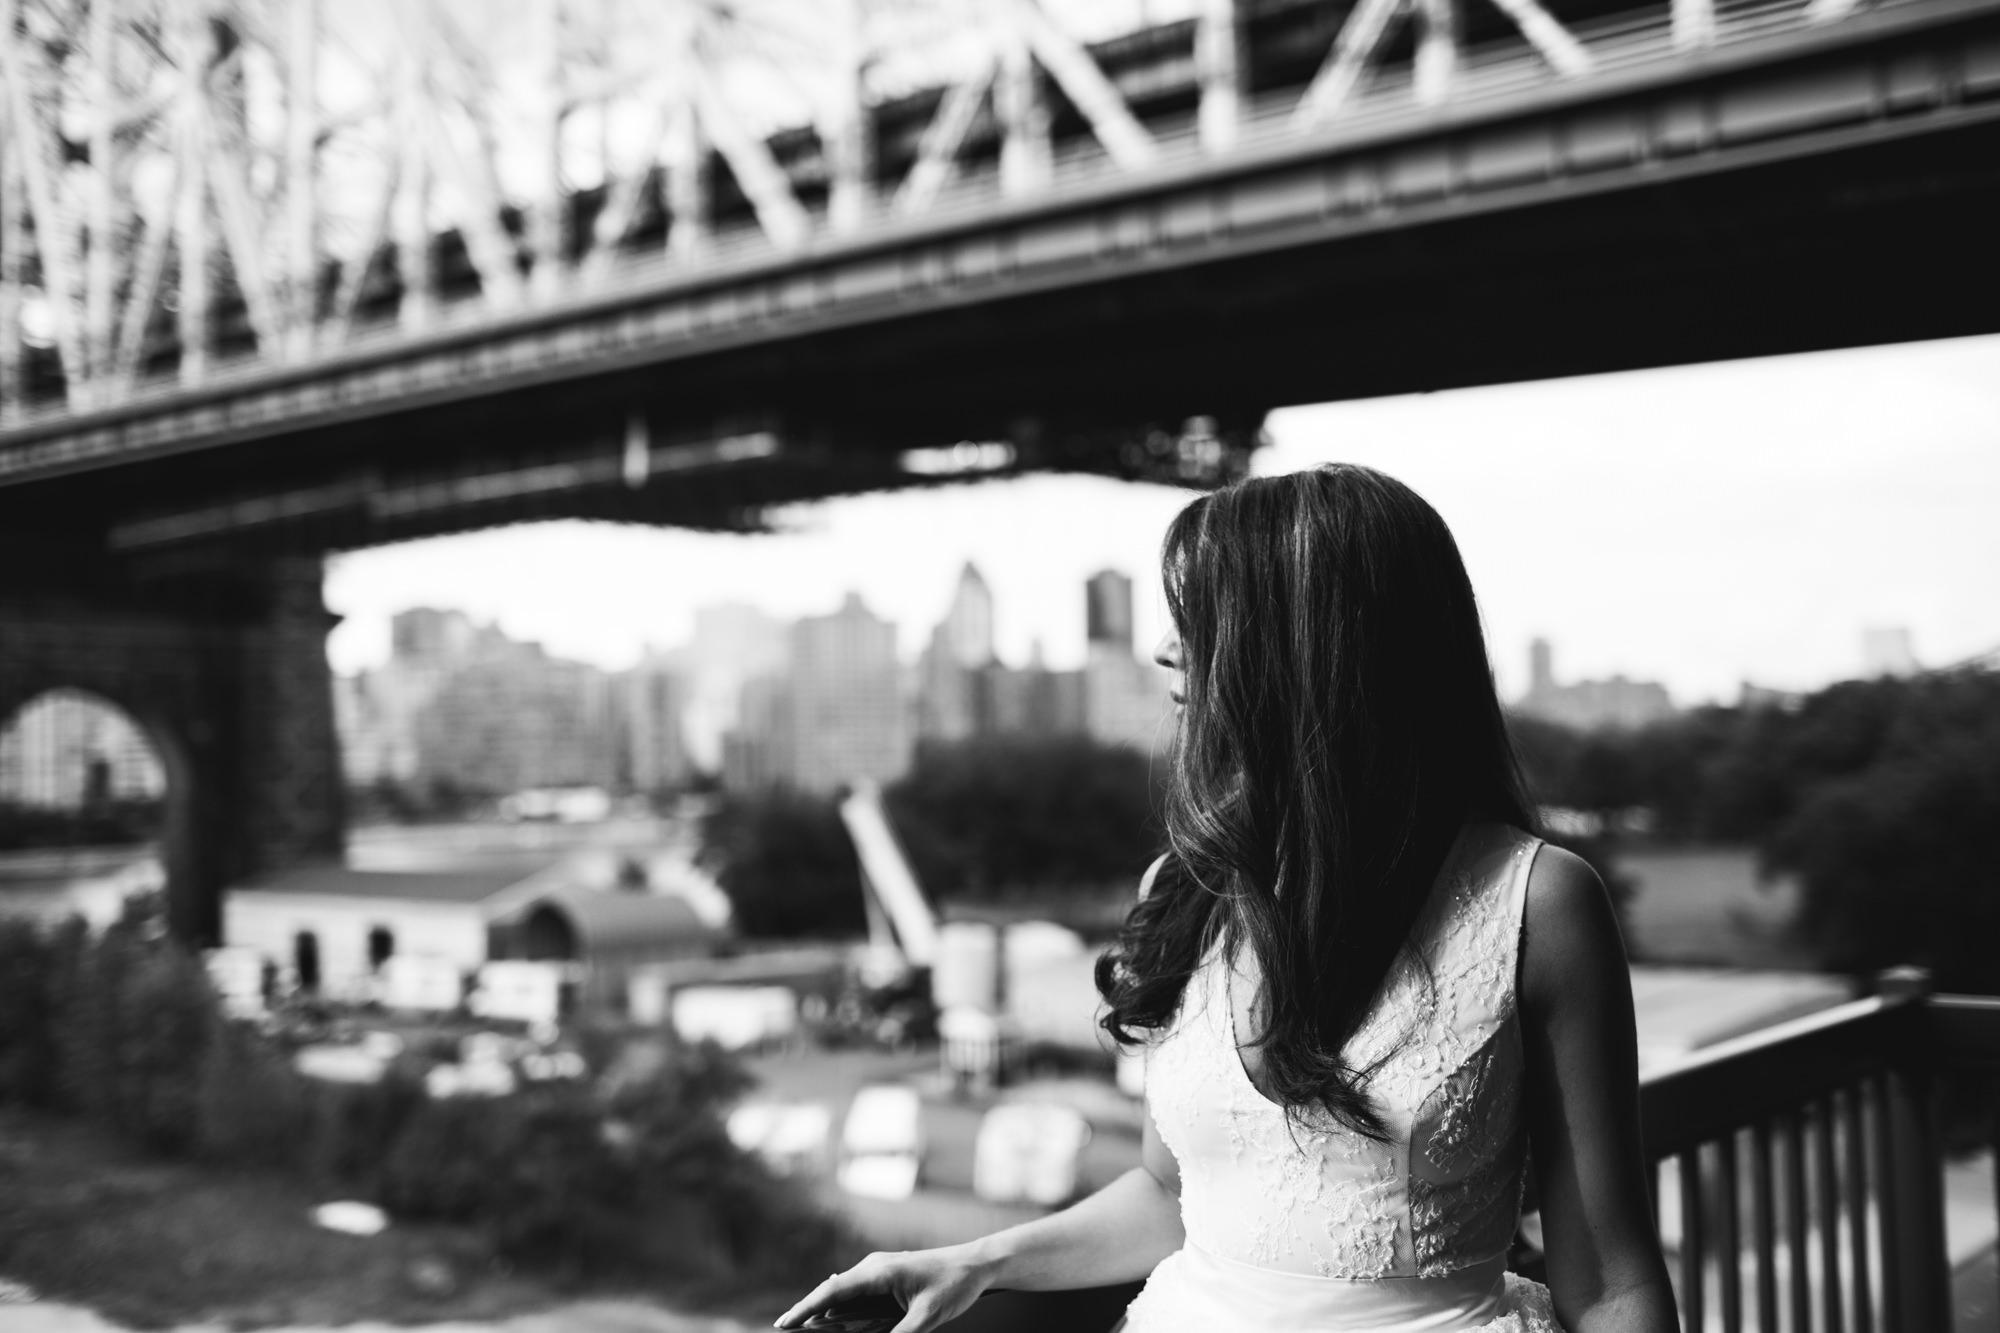 SAMMBLAKE_NYCPHOTOGRAPHER_JAG_0047.jpg